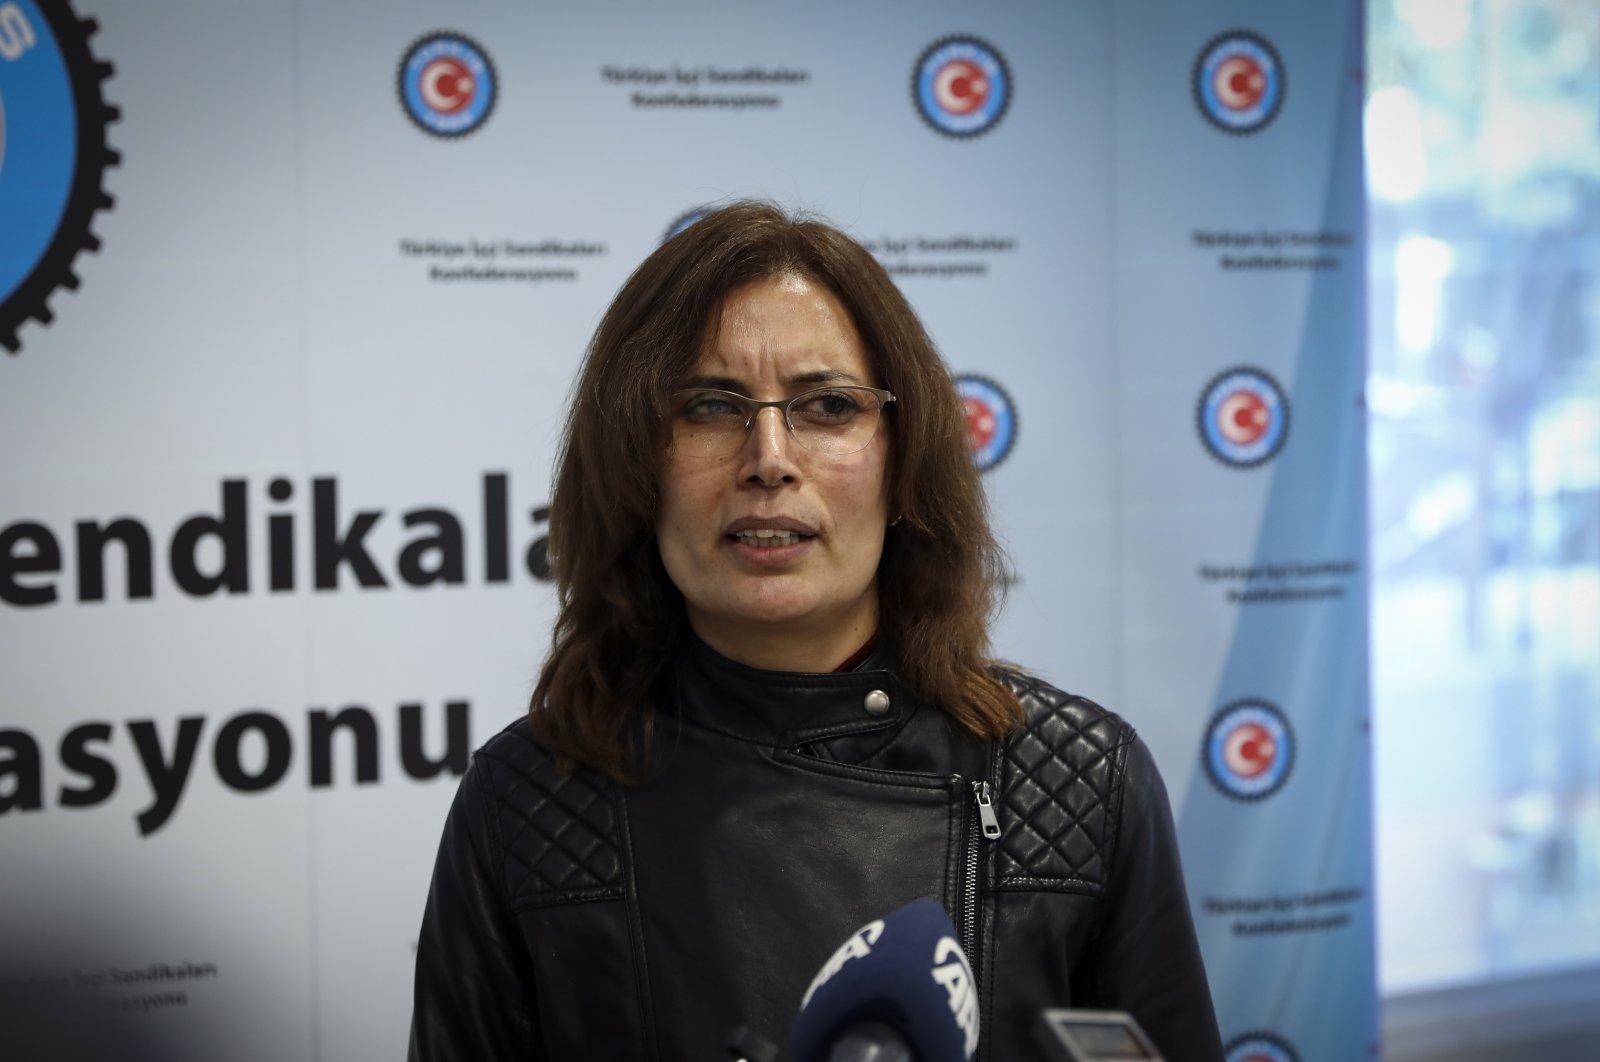 Özgül Yardımcı speaks to the press, capital Ankara, Turkey, Dec. 11, 2020. (AA Photo)